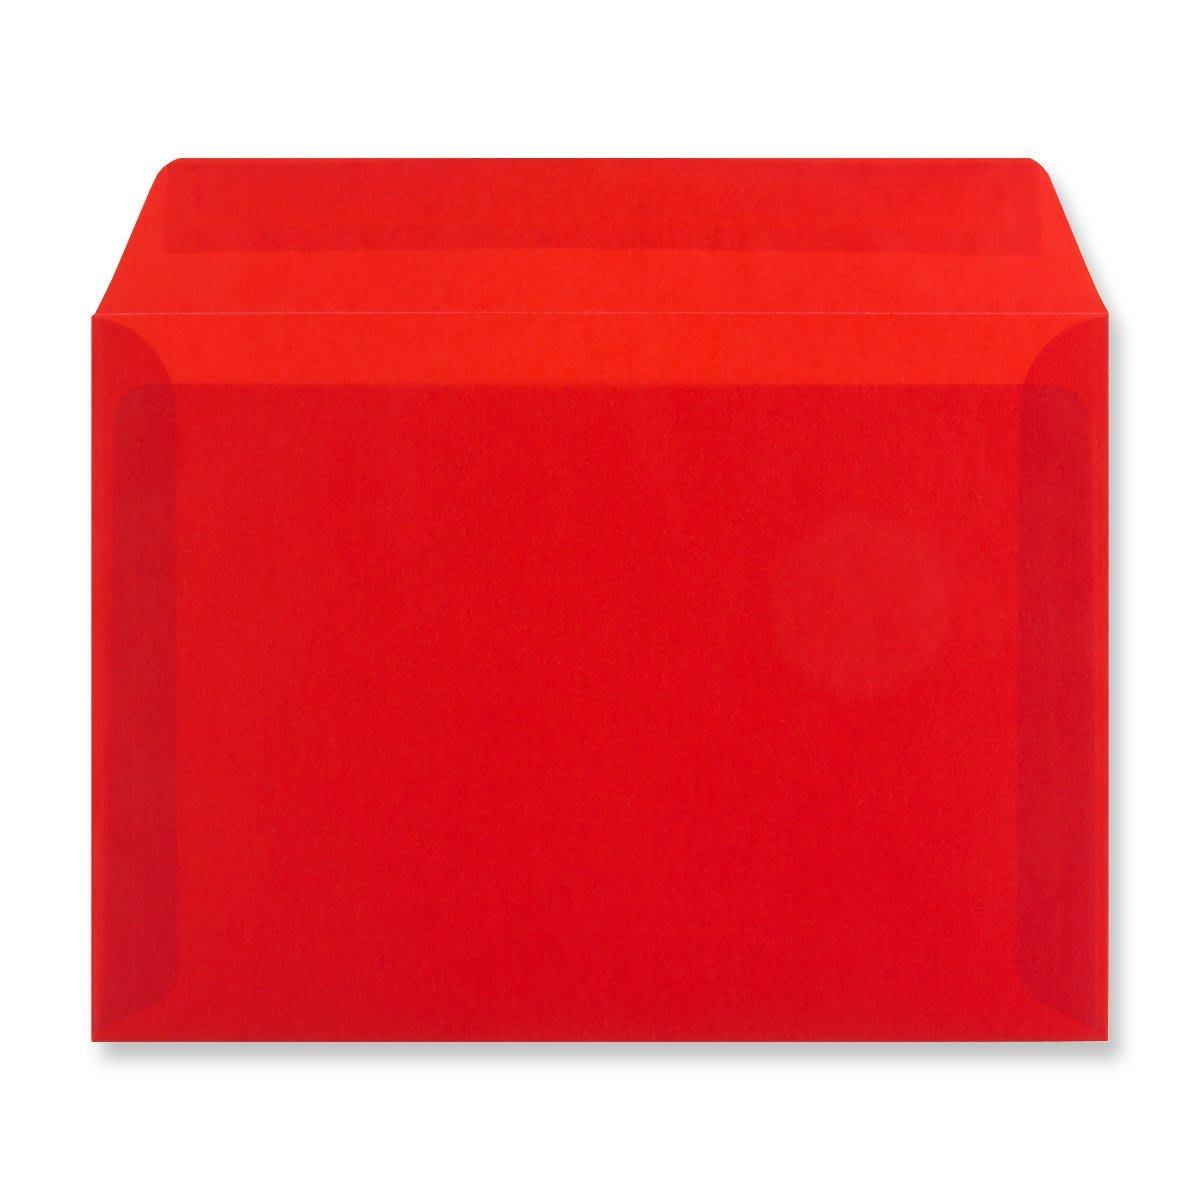 C5 RED TRANSLUCENT ENVELOPES